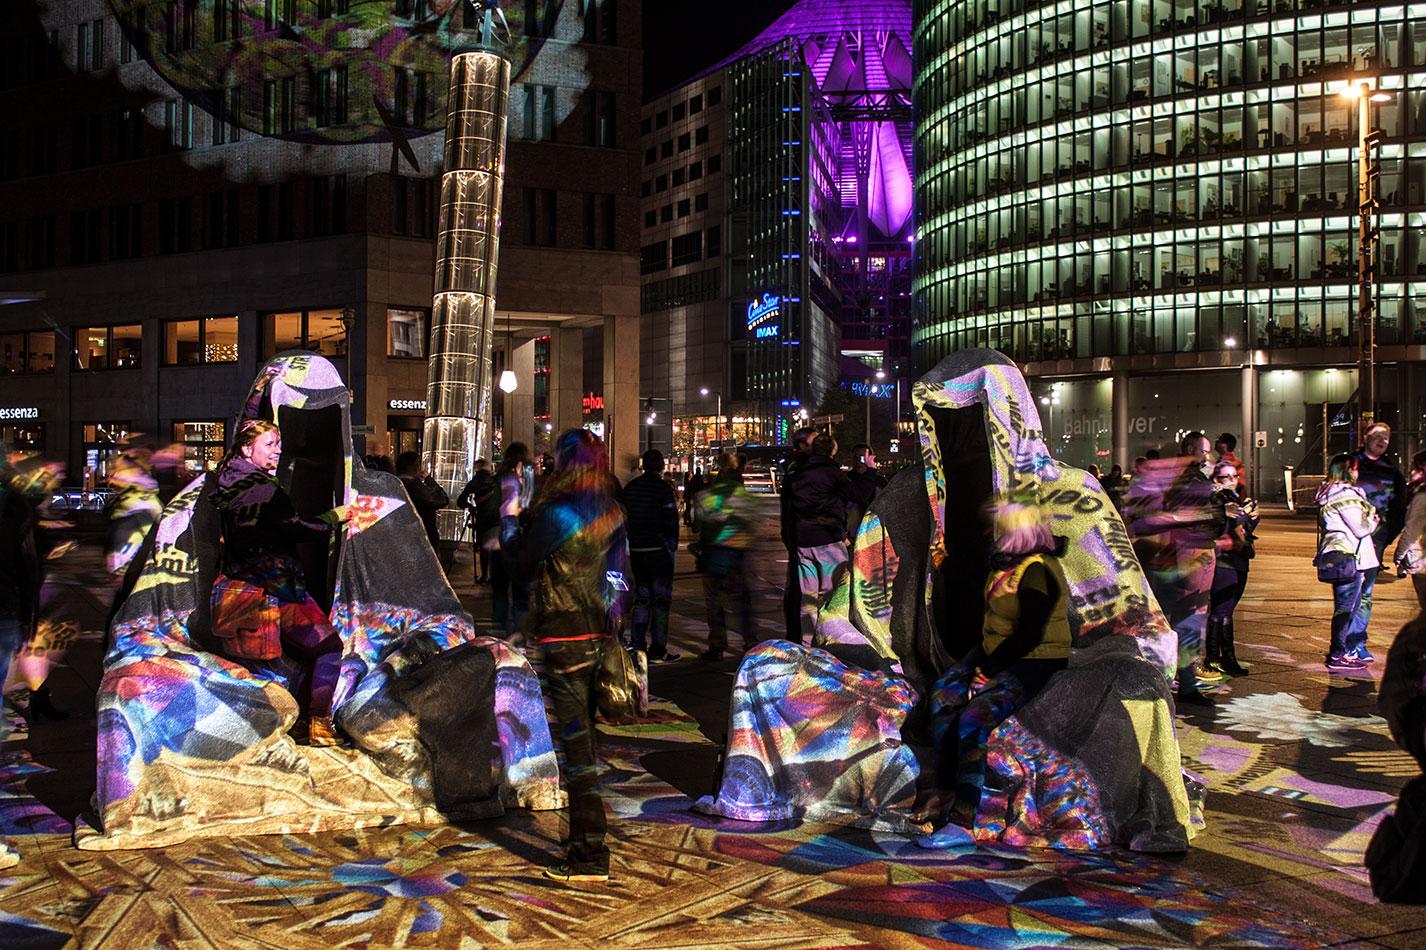 festival-of-lights-berlin-potzdamer-platz-light-art-show-exhibition-lumina-guardians-of-time-manfred-kili-kielnhofer-contemporary-arts-design-large-scale-monumental-public-sculpture-3672